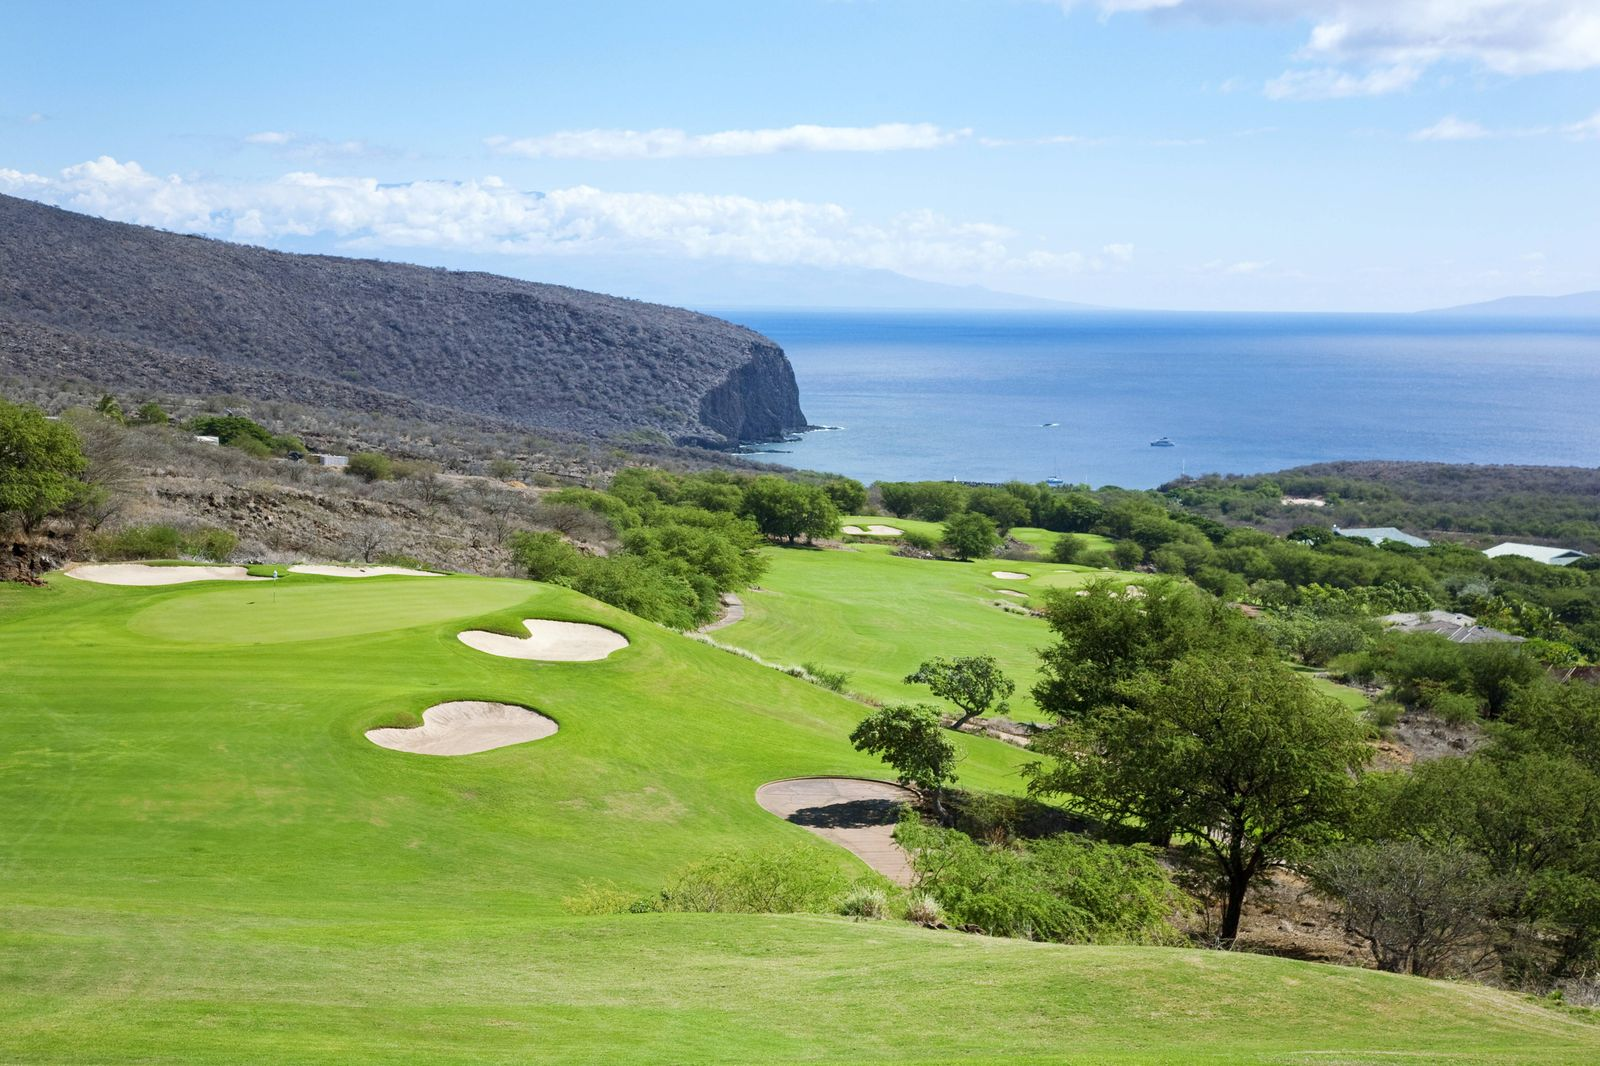 Hawaii Lanai The Challenge At Manele Golf Course PUBLICATIONxINxGERxSUIxAUTxONLY Copyright RonxD